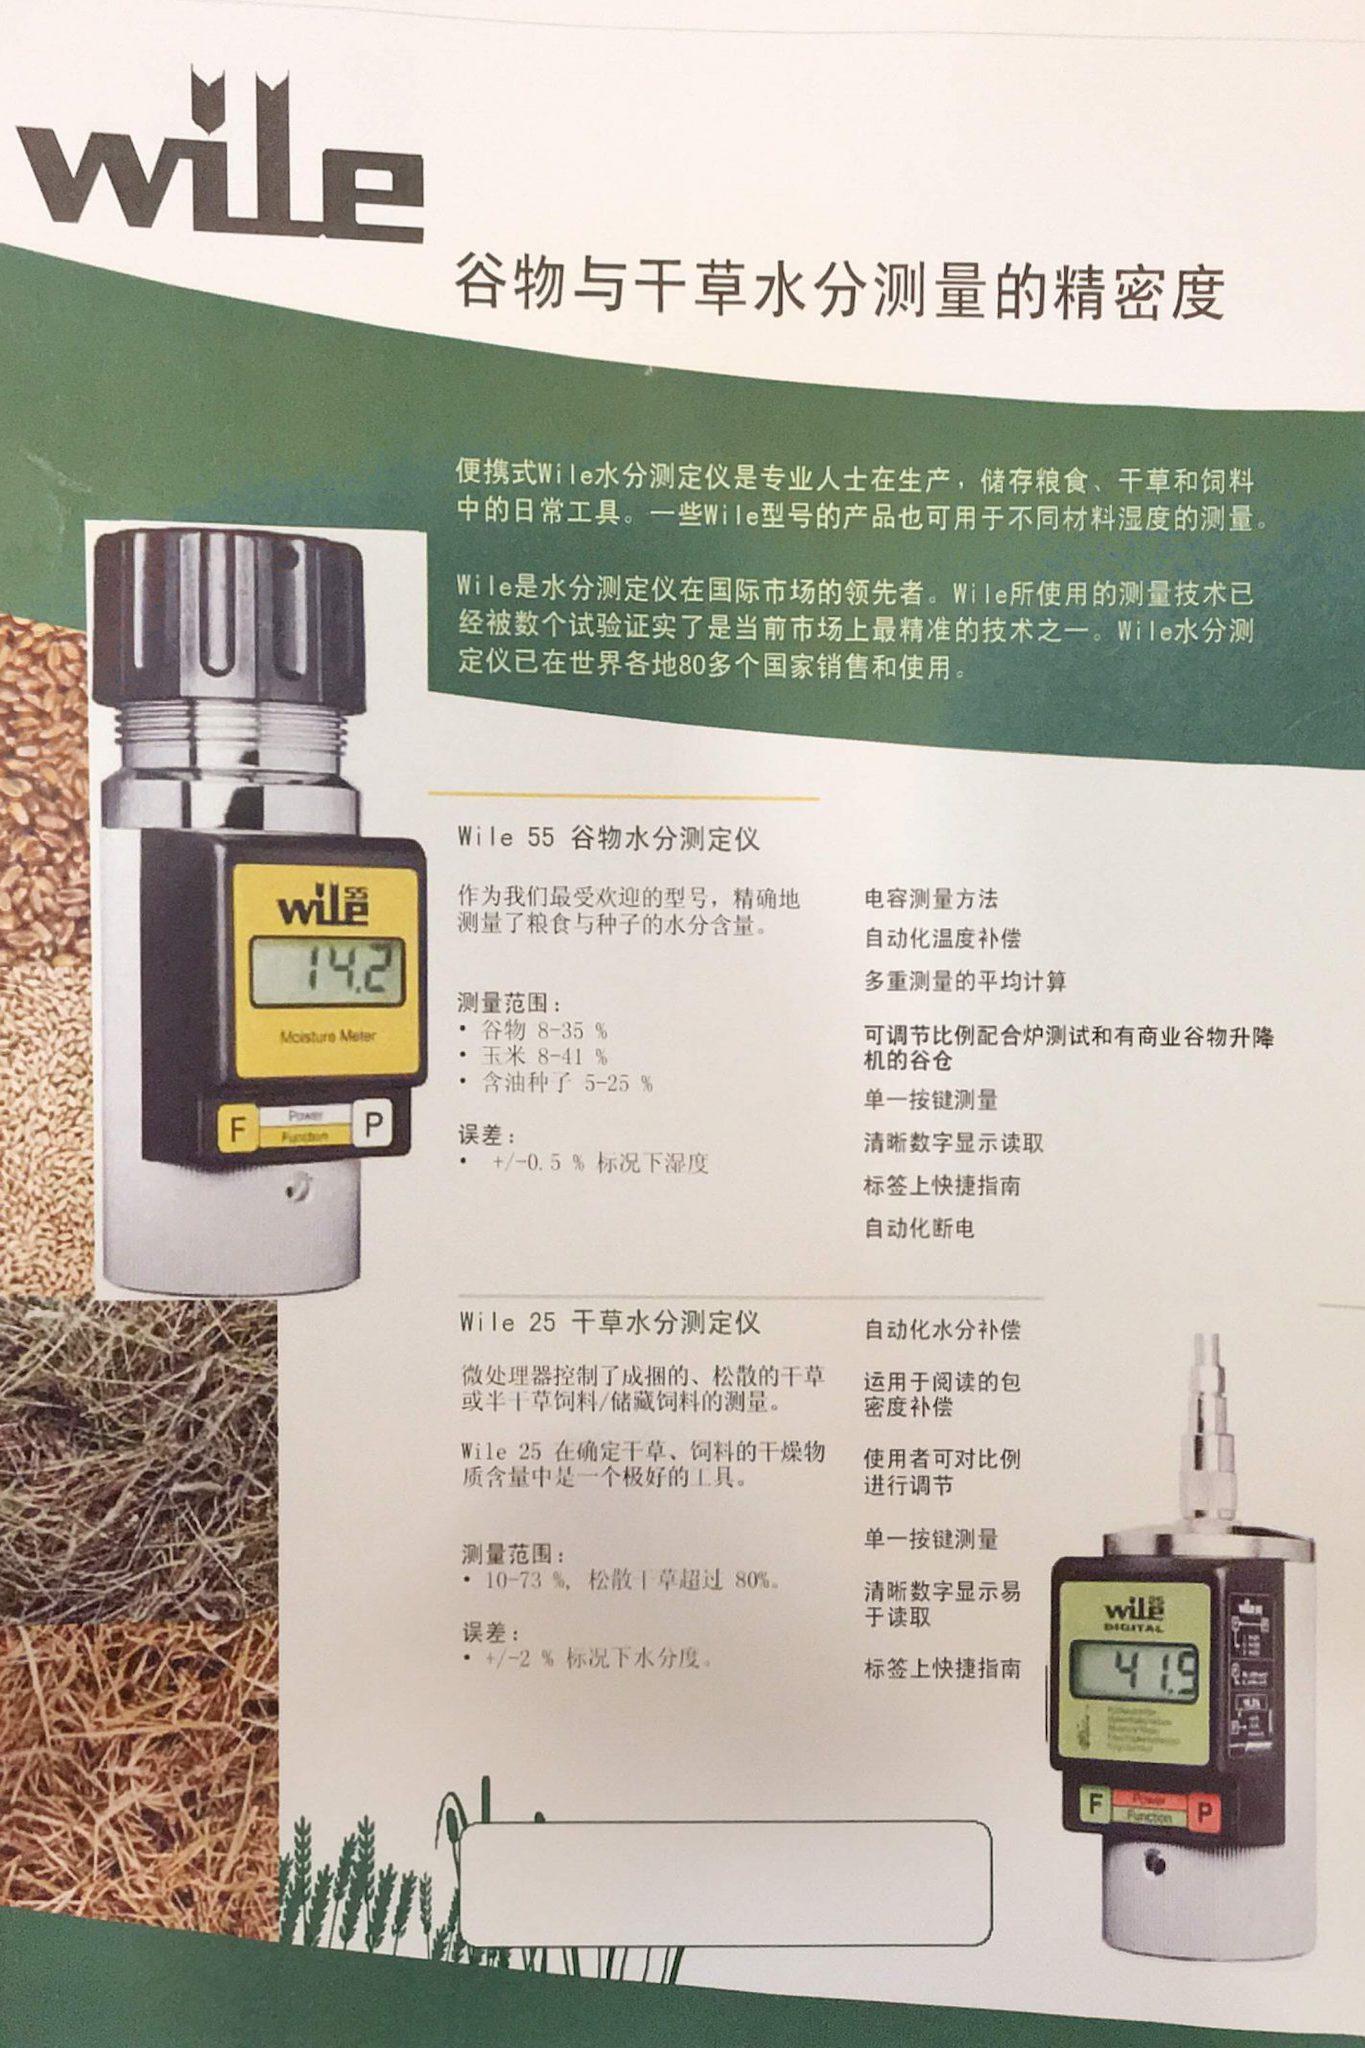 tekway-company-leaflets-brochures-wile-e1585129978524-1423x2048